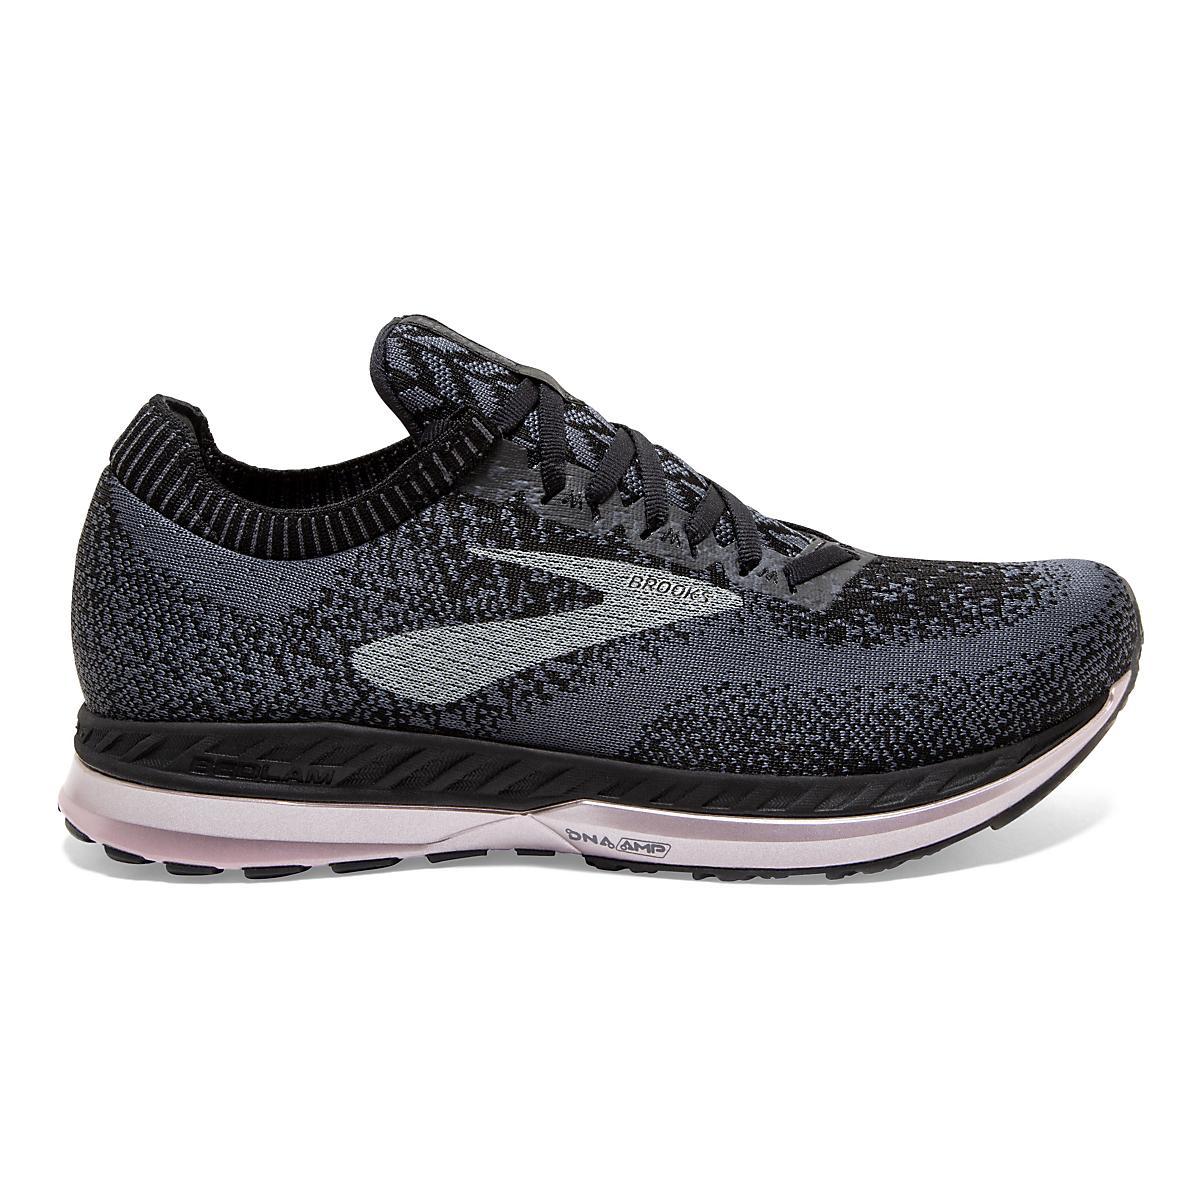 88acb101481f8 Womens Brooks Bedlam Running Shoe at Road Runner Sports